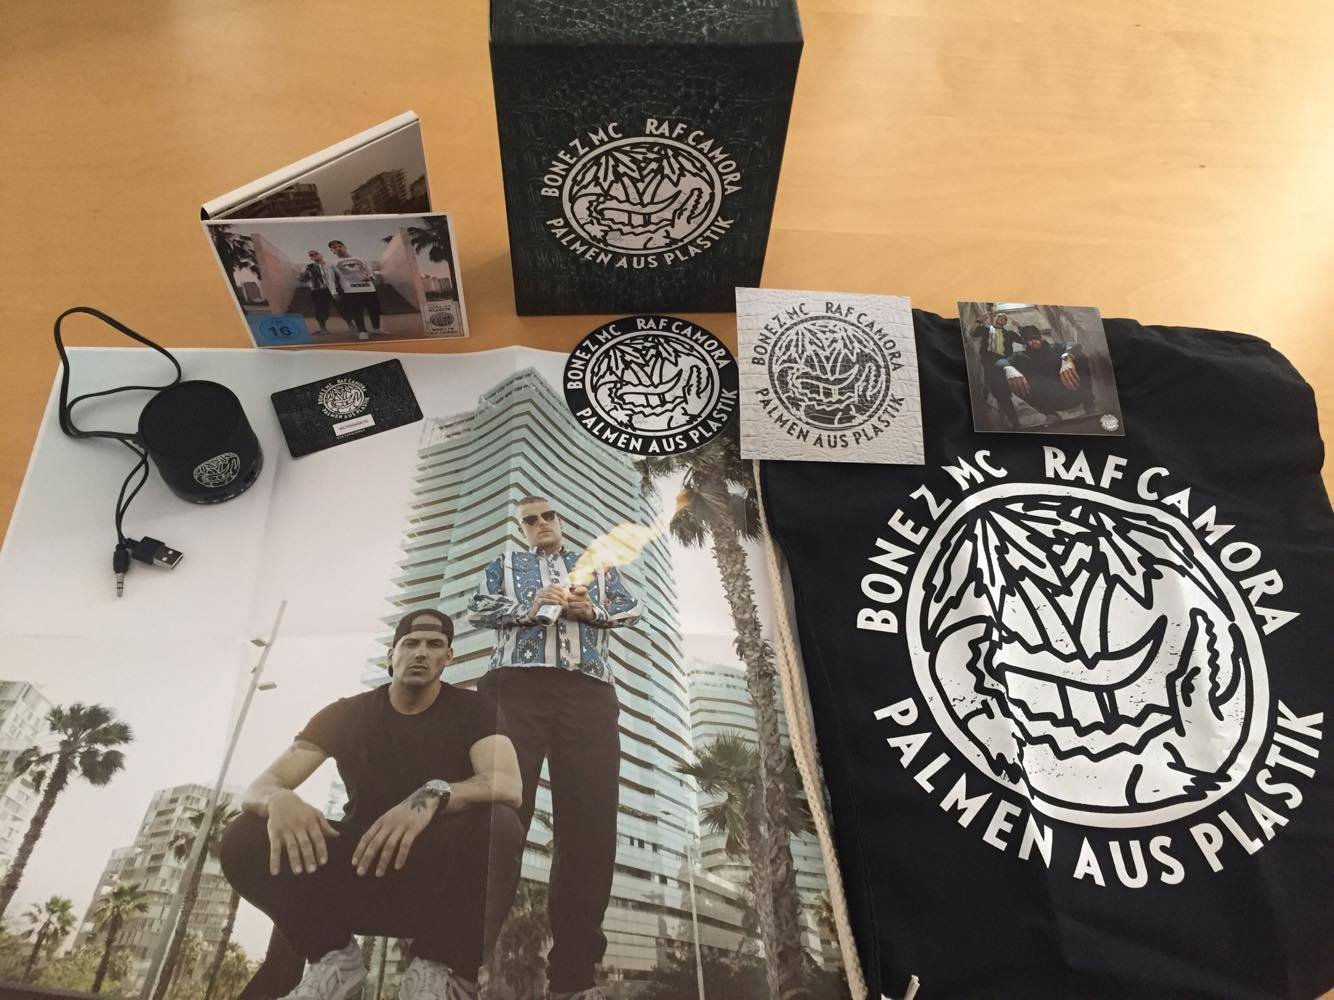 Bonez Mc Raf Camora Palmen Aus Plastik Cover Features Release